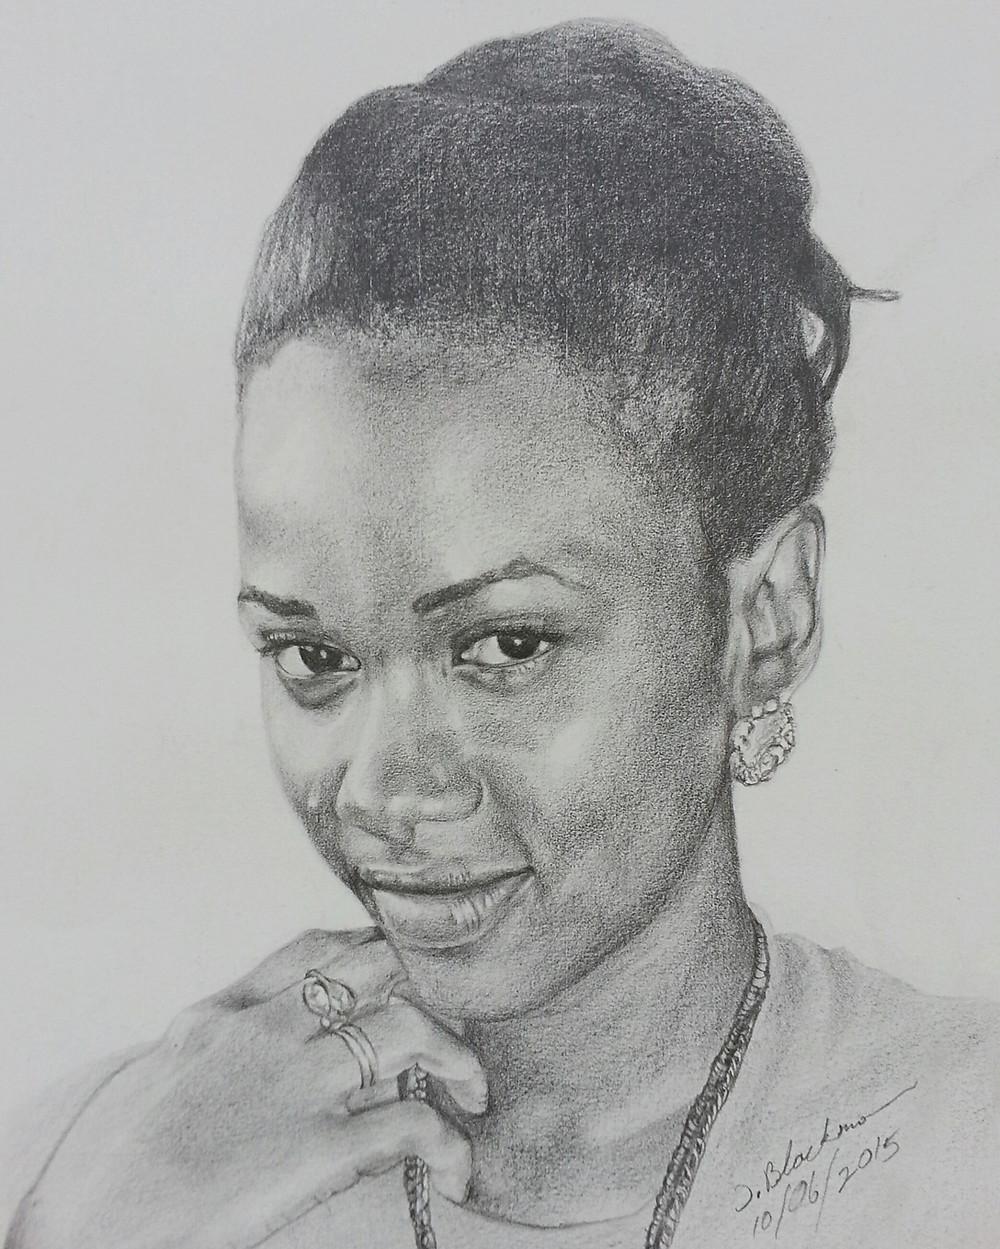 A graphite pencil portrait by Travell Blackman